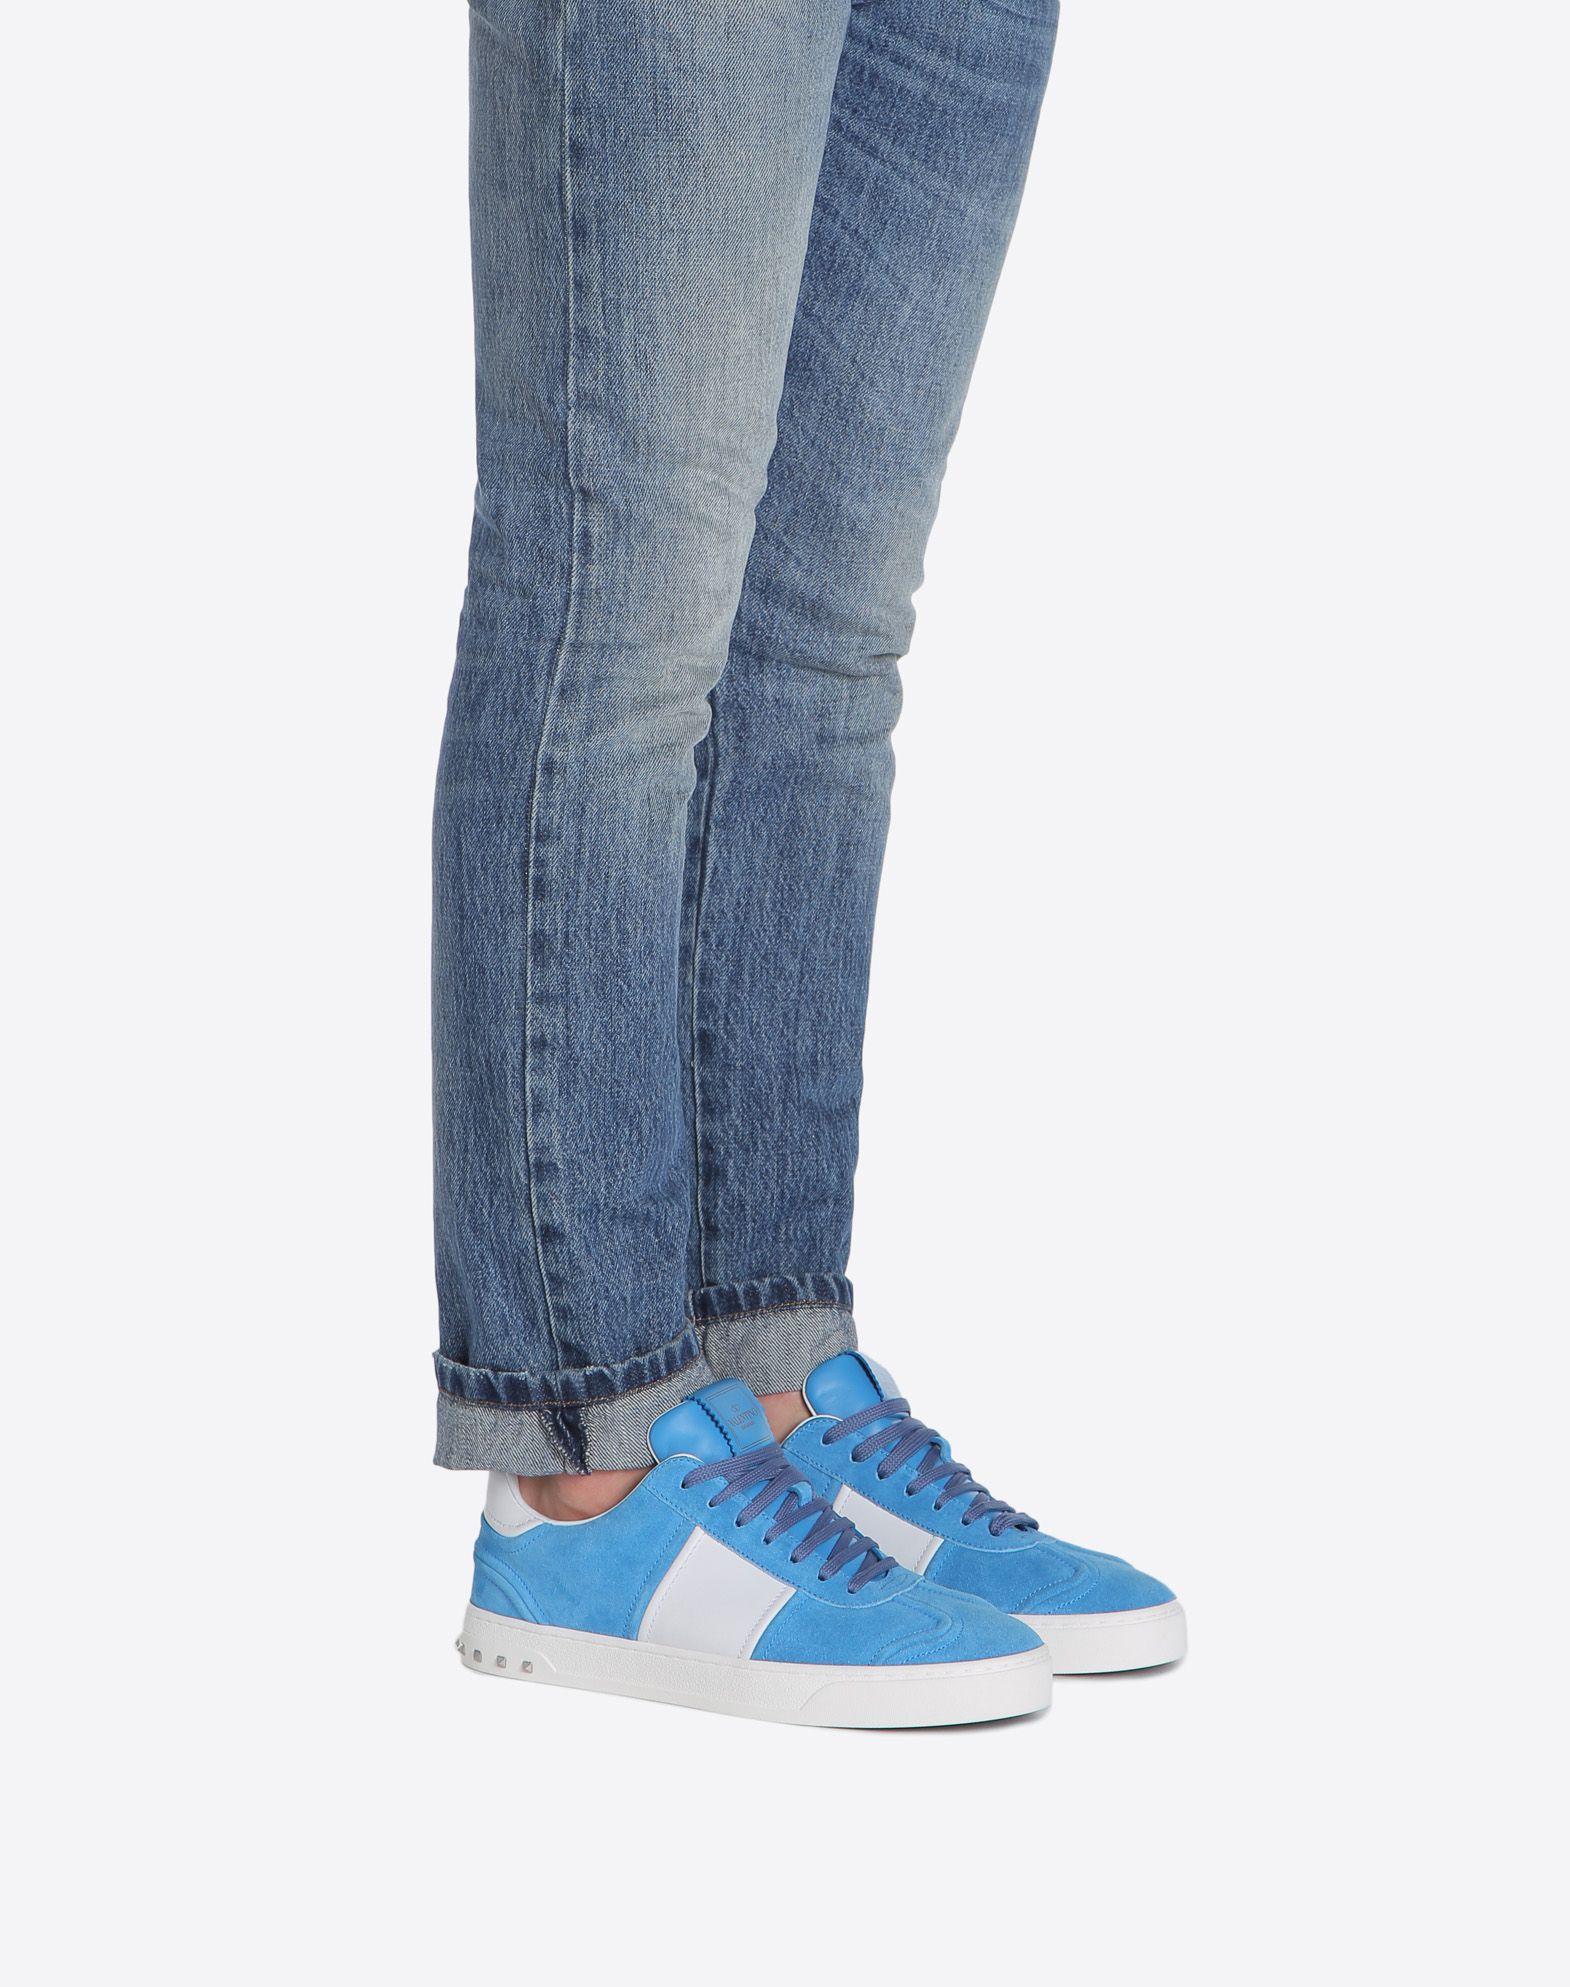 VALENTINO GARAVANI UOMO Flycrew Sneaker LOW-TOP SNEAKERS U a